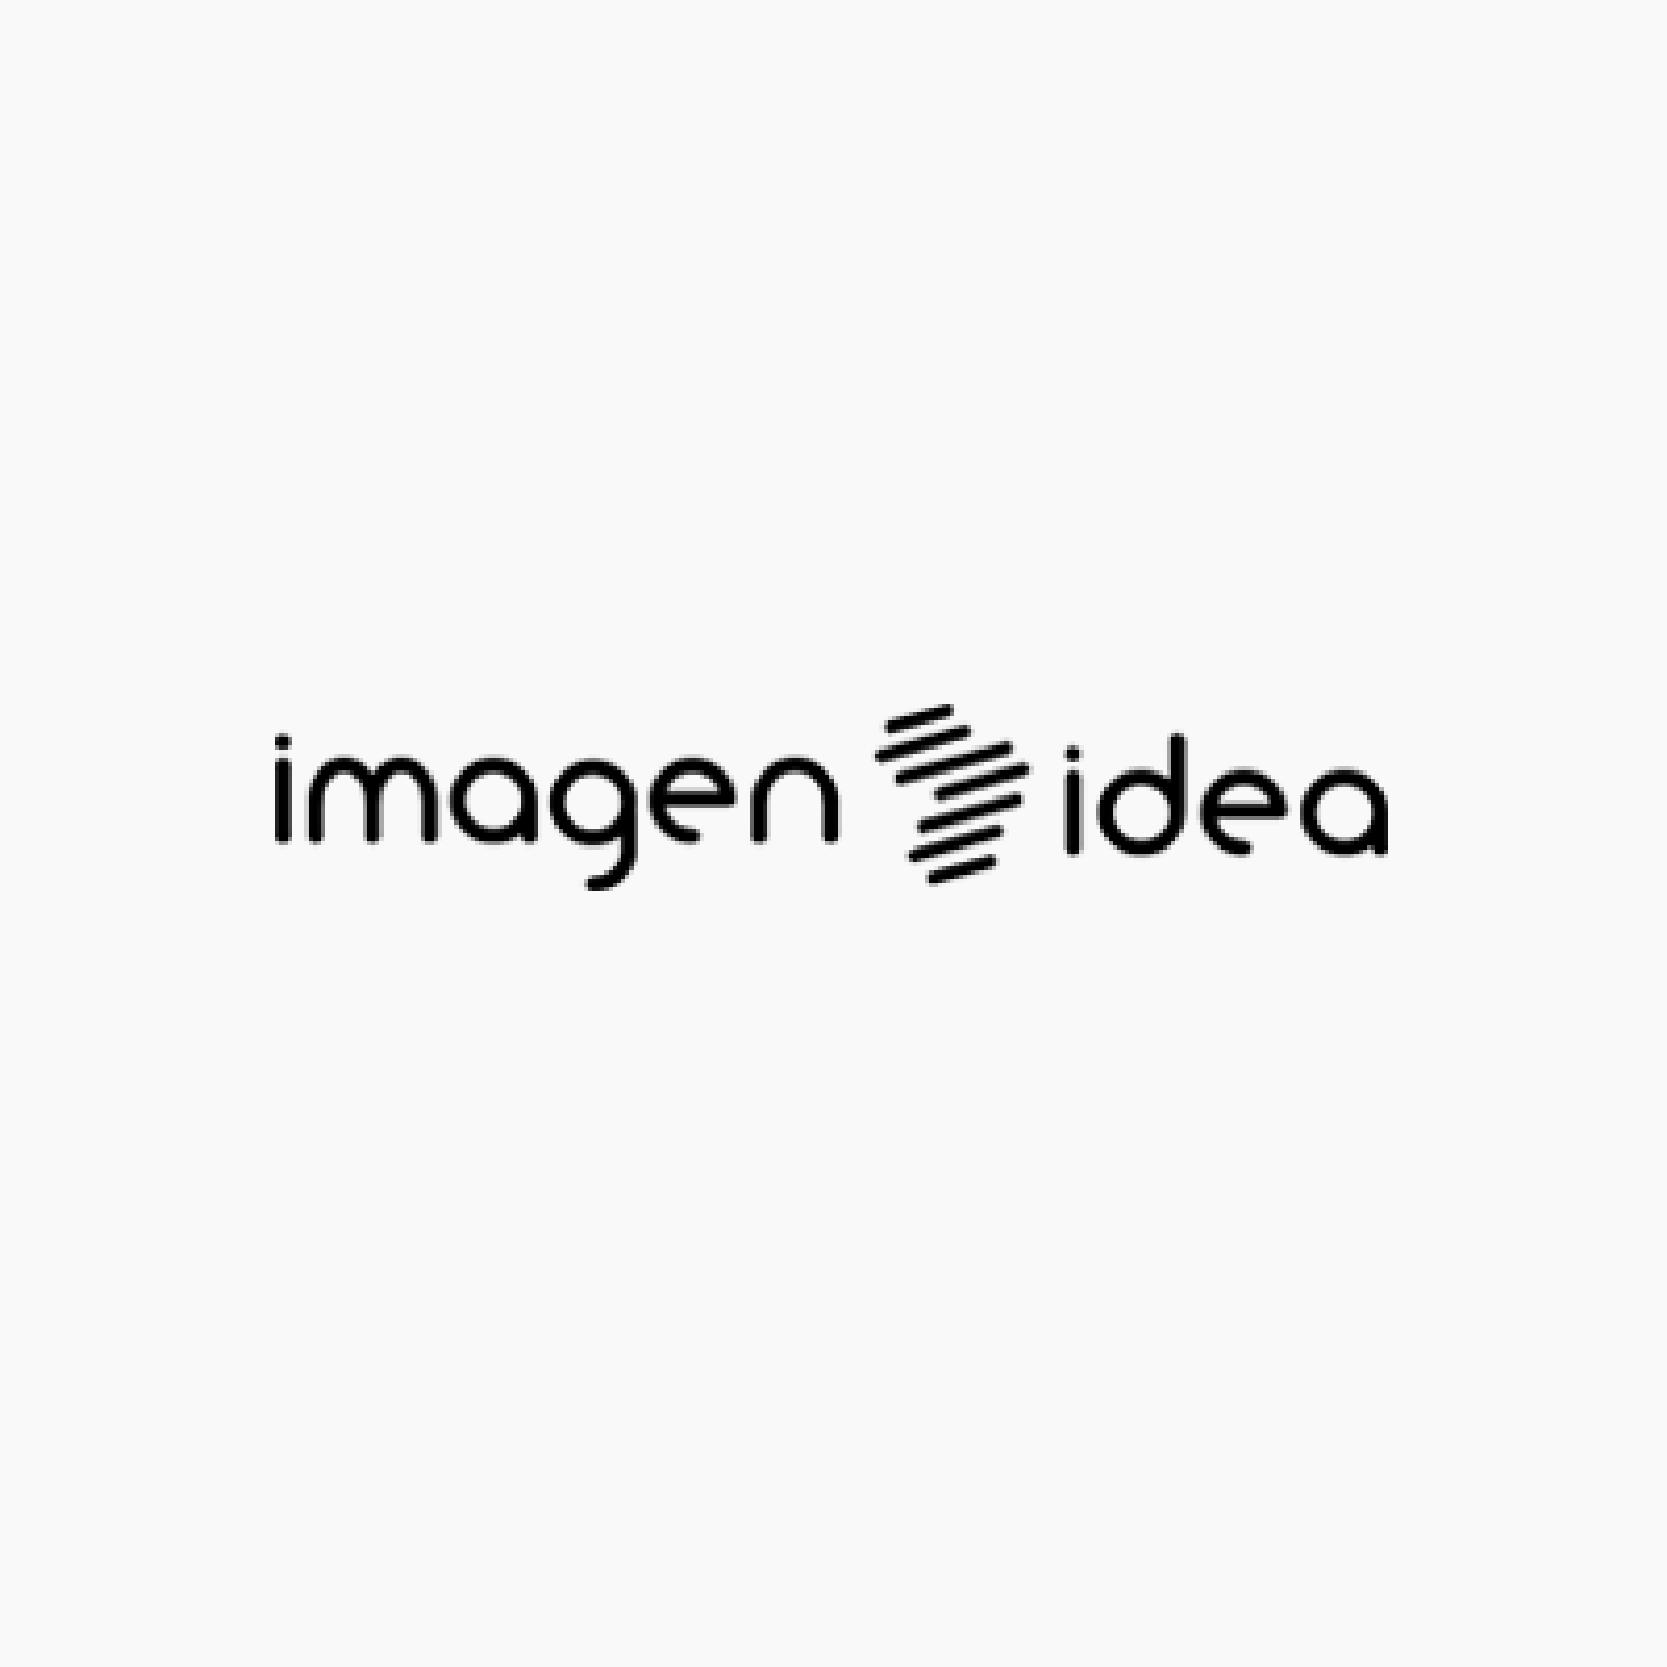 ImagenIdea